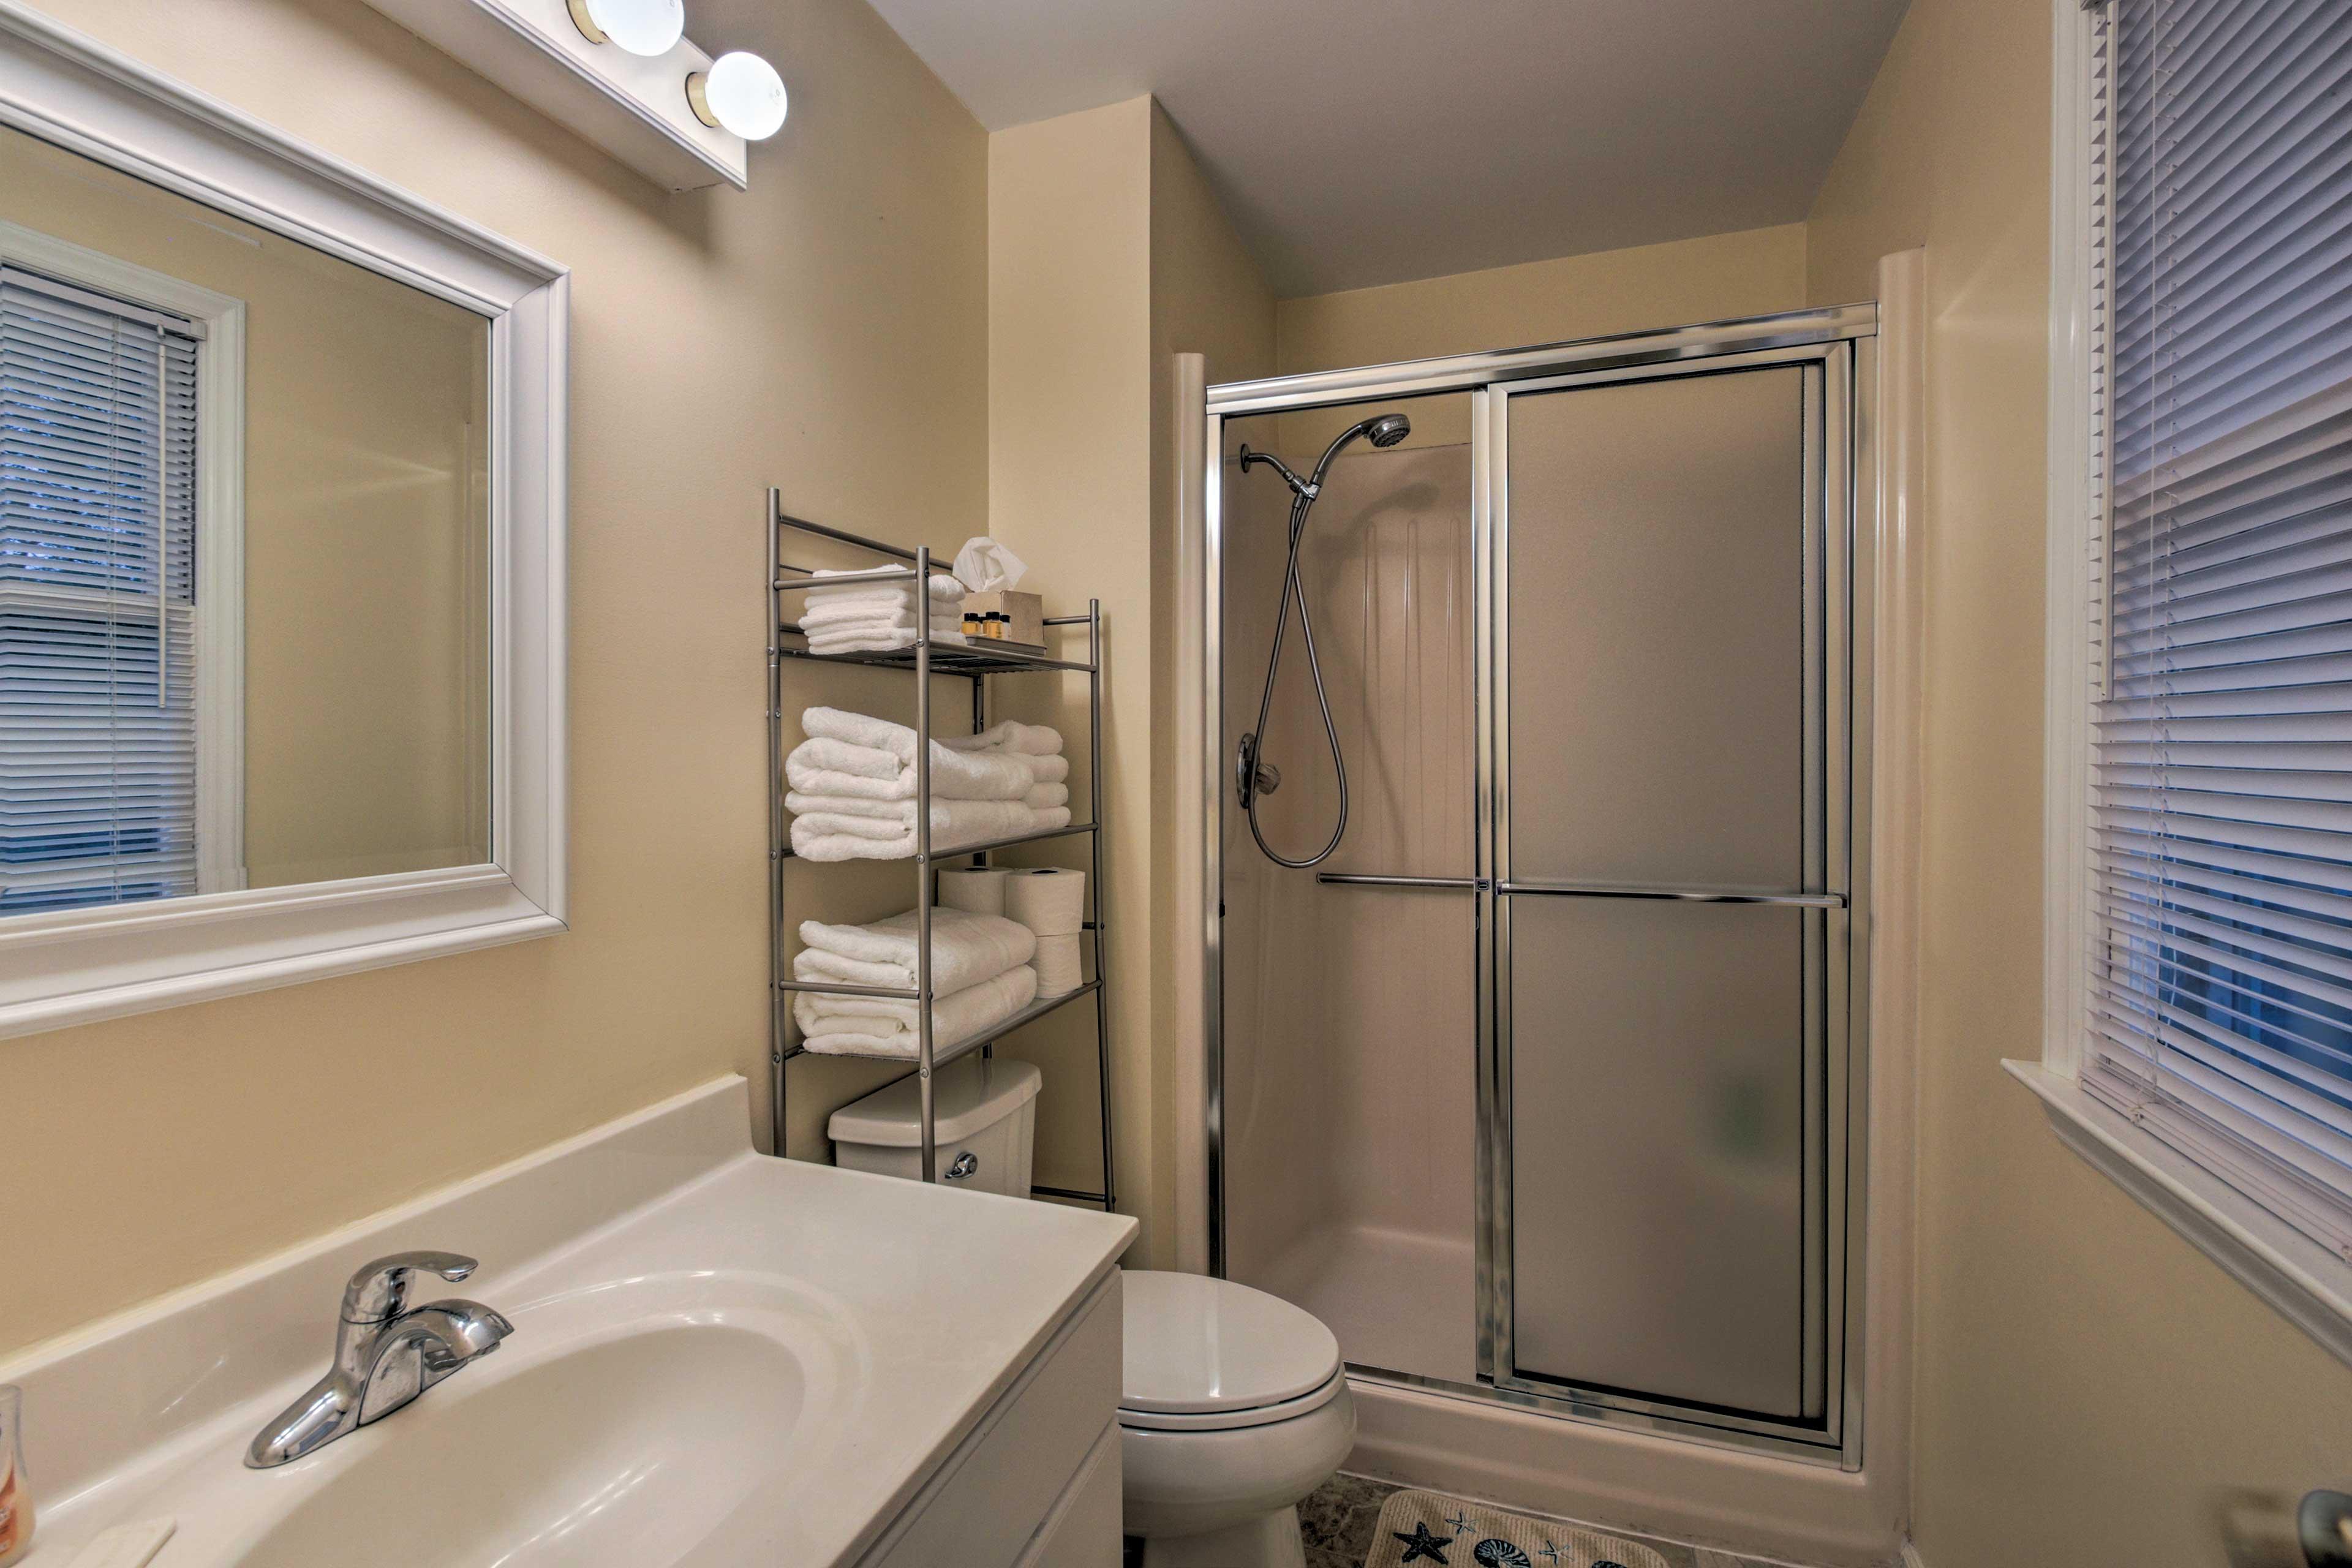 Sliding glass doors frame the walk-in shower in this bathroom.